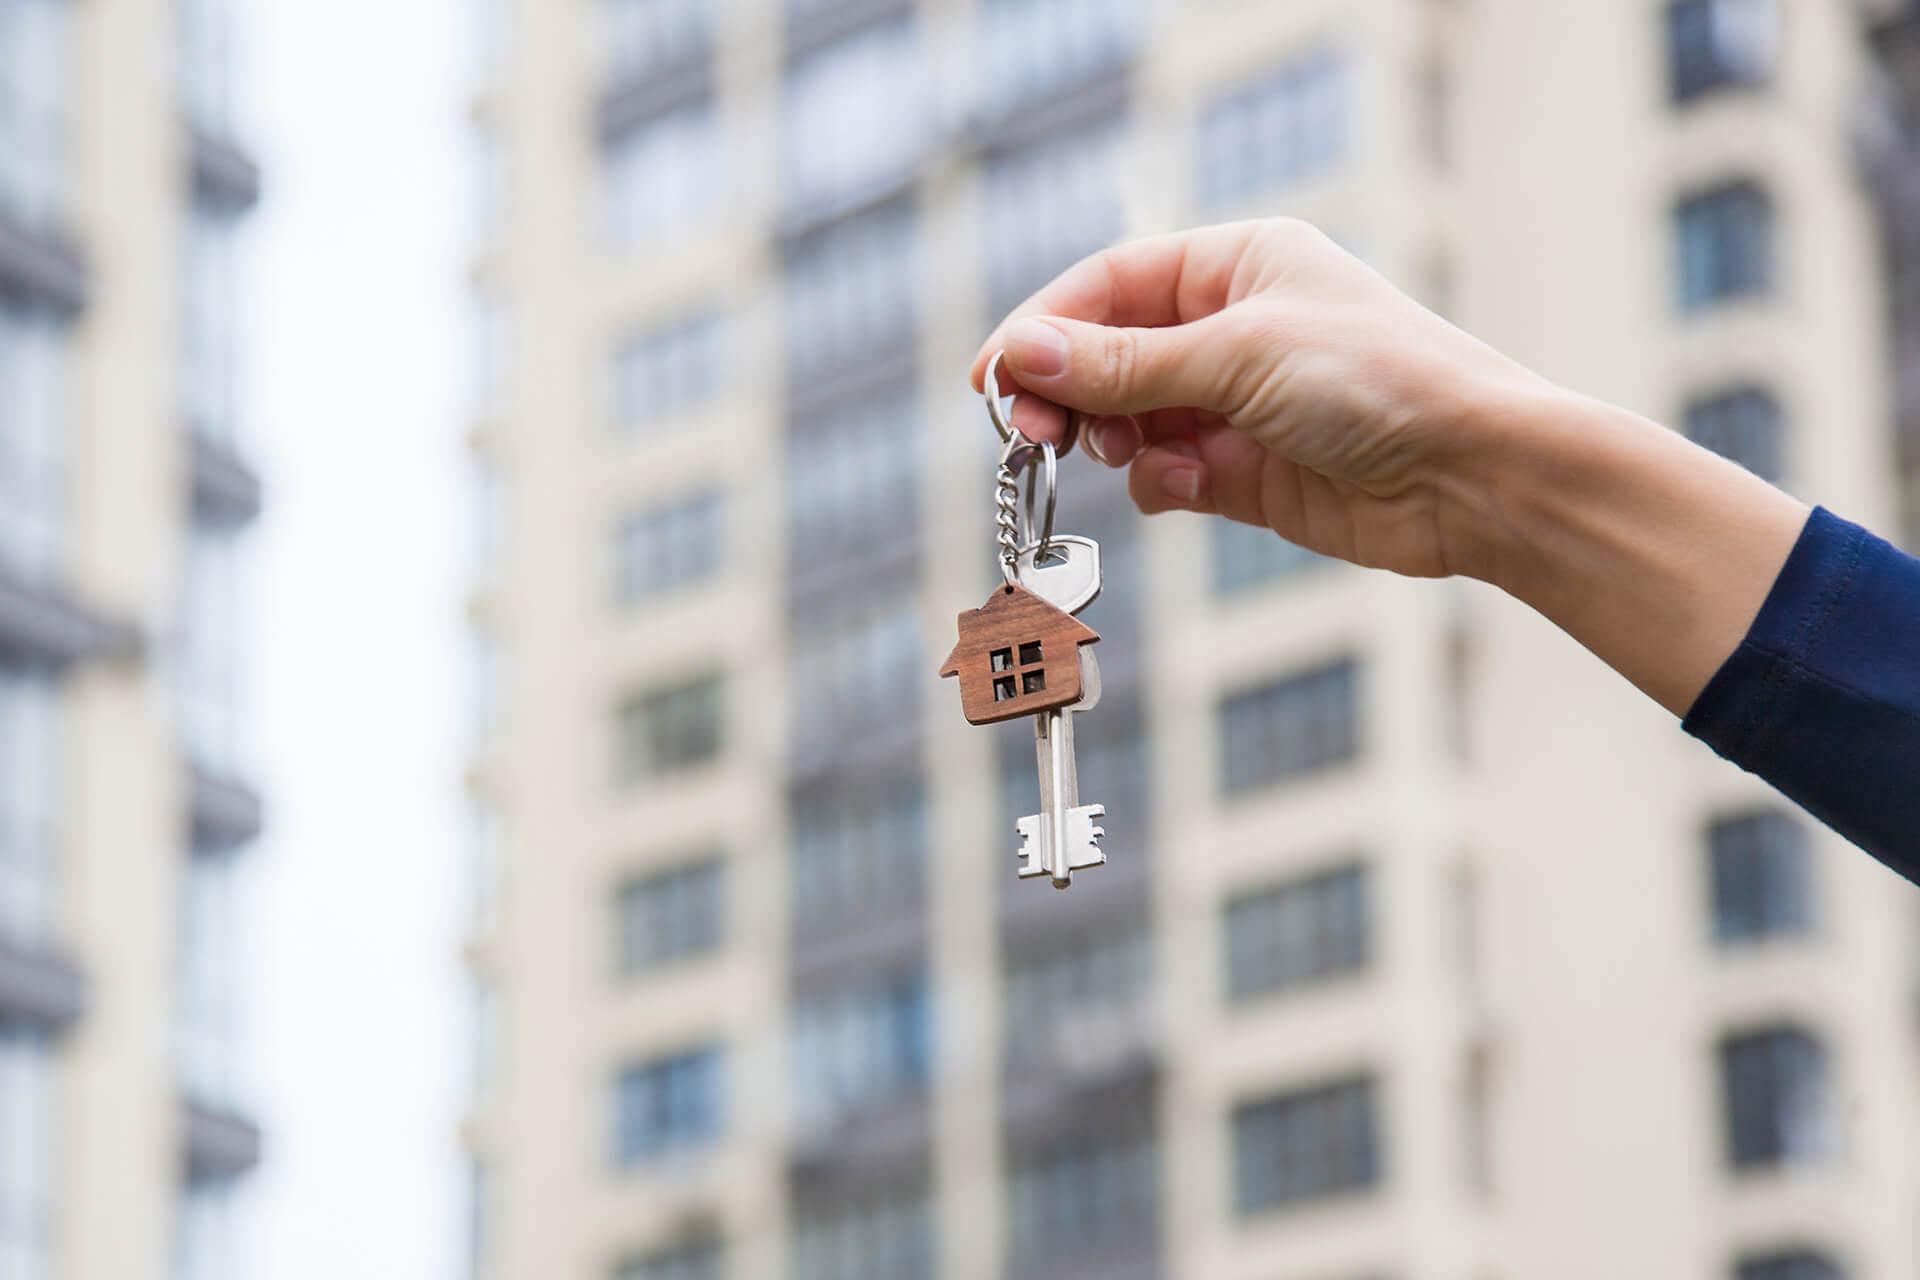 Key with a house-shaped pendant